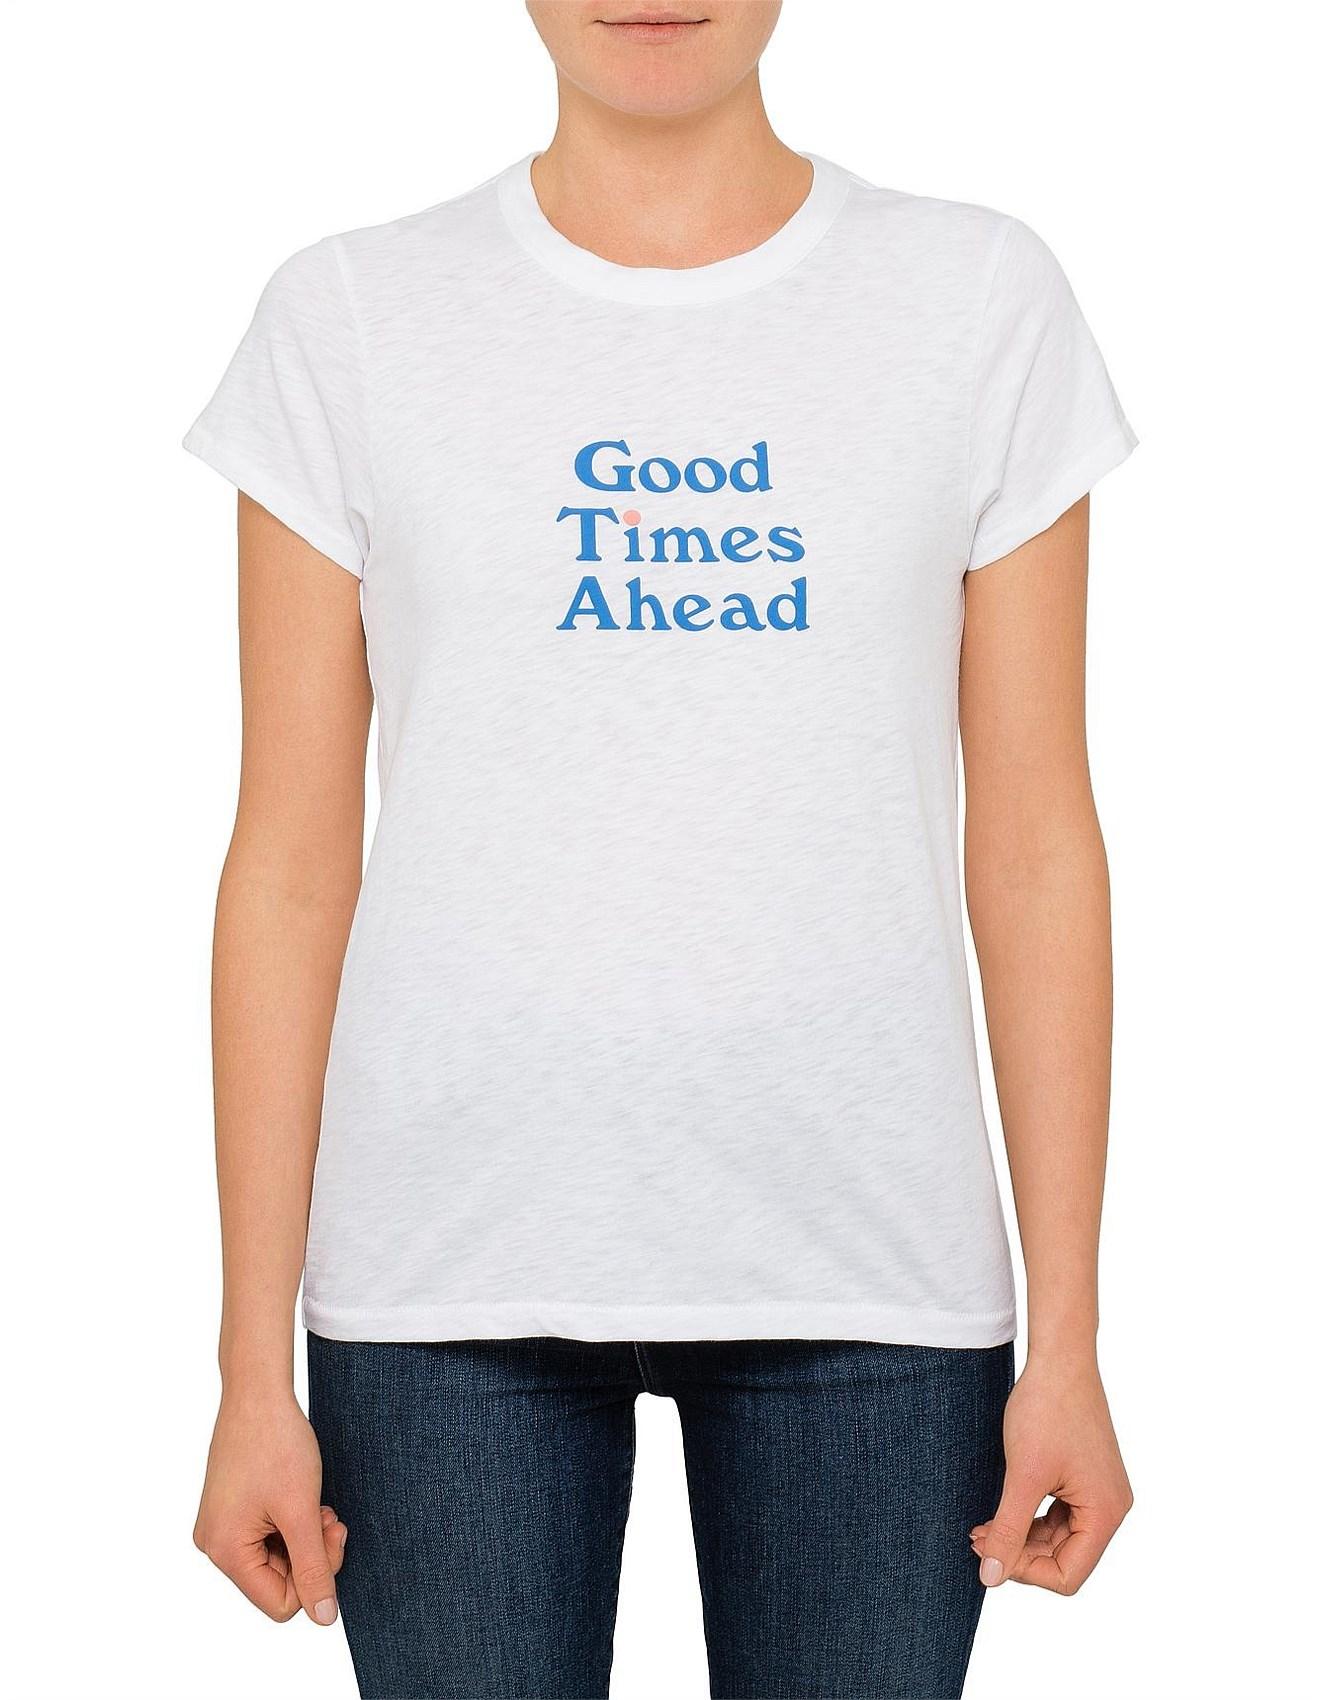 2a1543b3f Tops, Tees & T-Shirts - Good times Tee